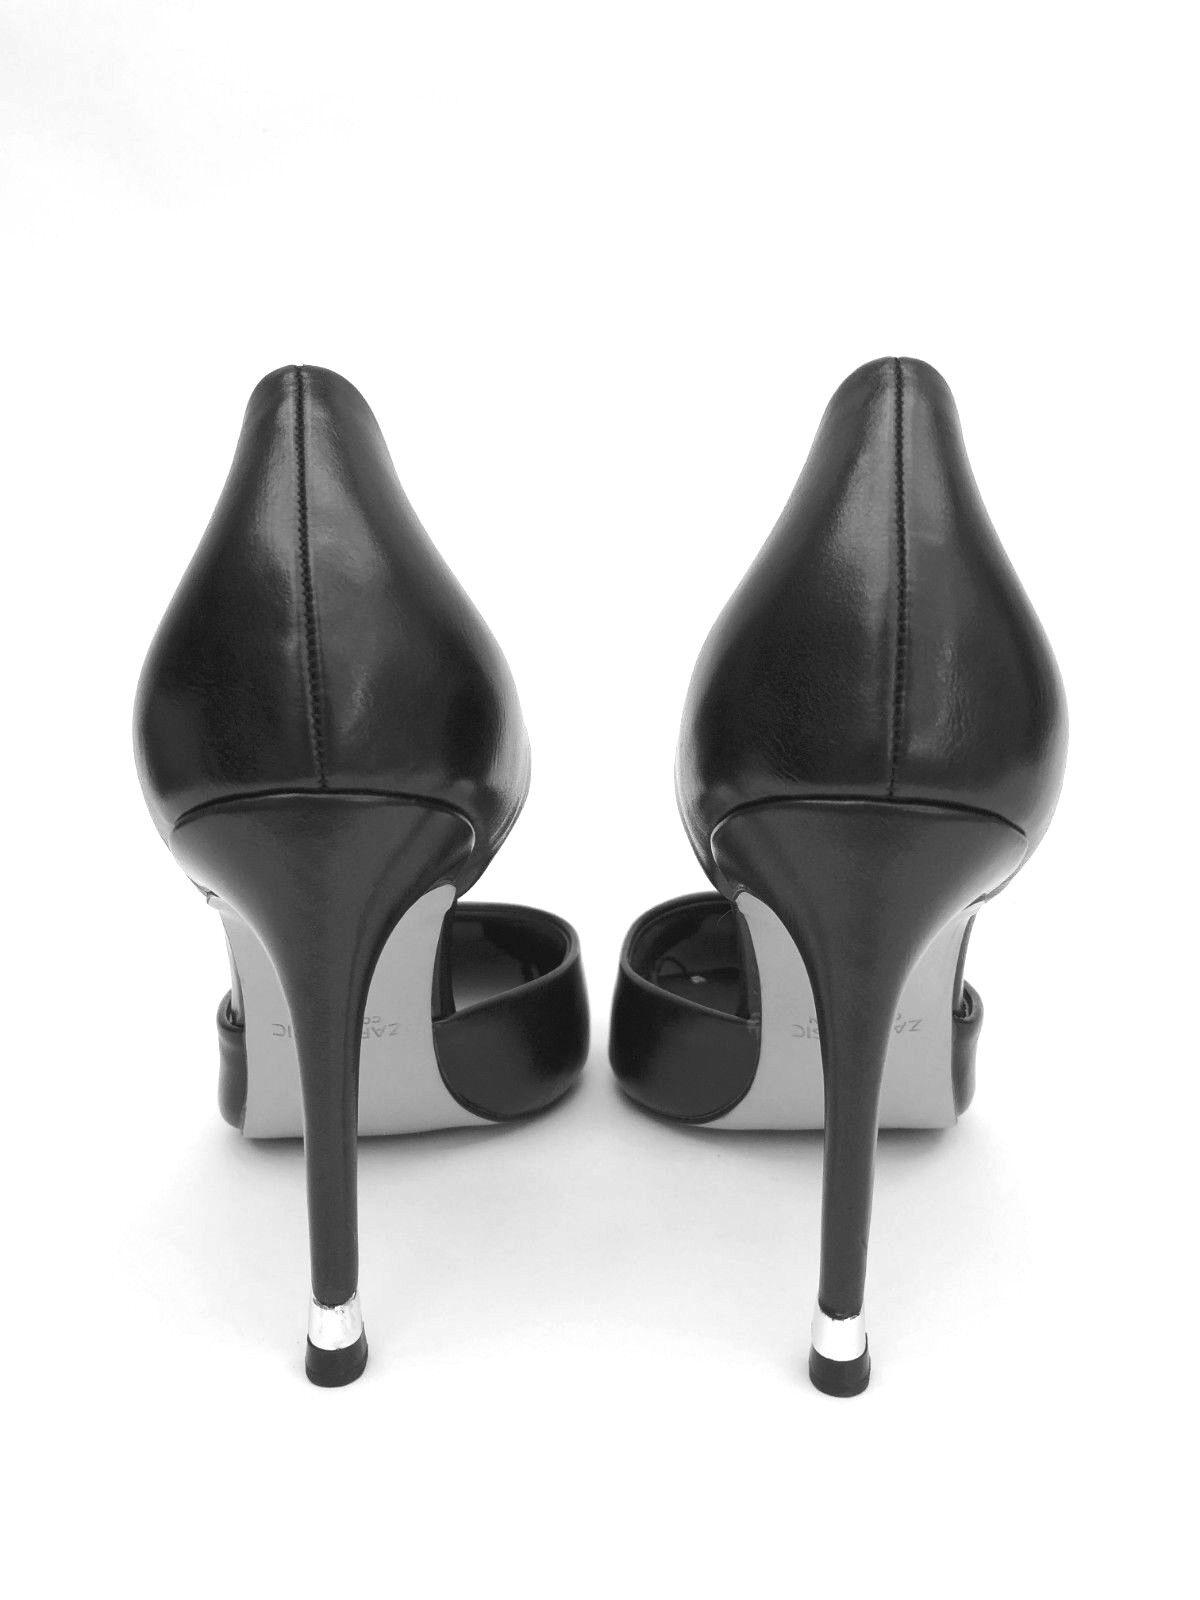 ZARA BLACK D'ORSAY HIGH HEEL Schuhe SIZE UK 5 UK 7 REF 2232 301